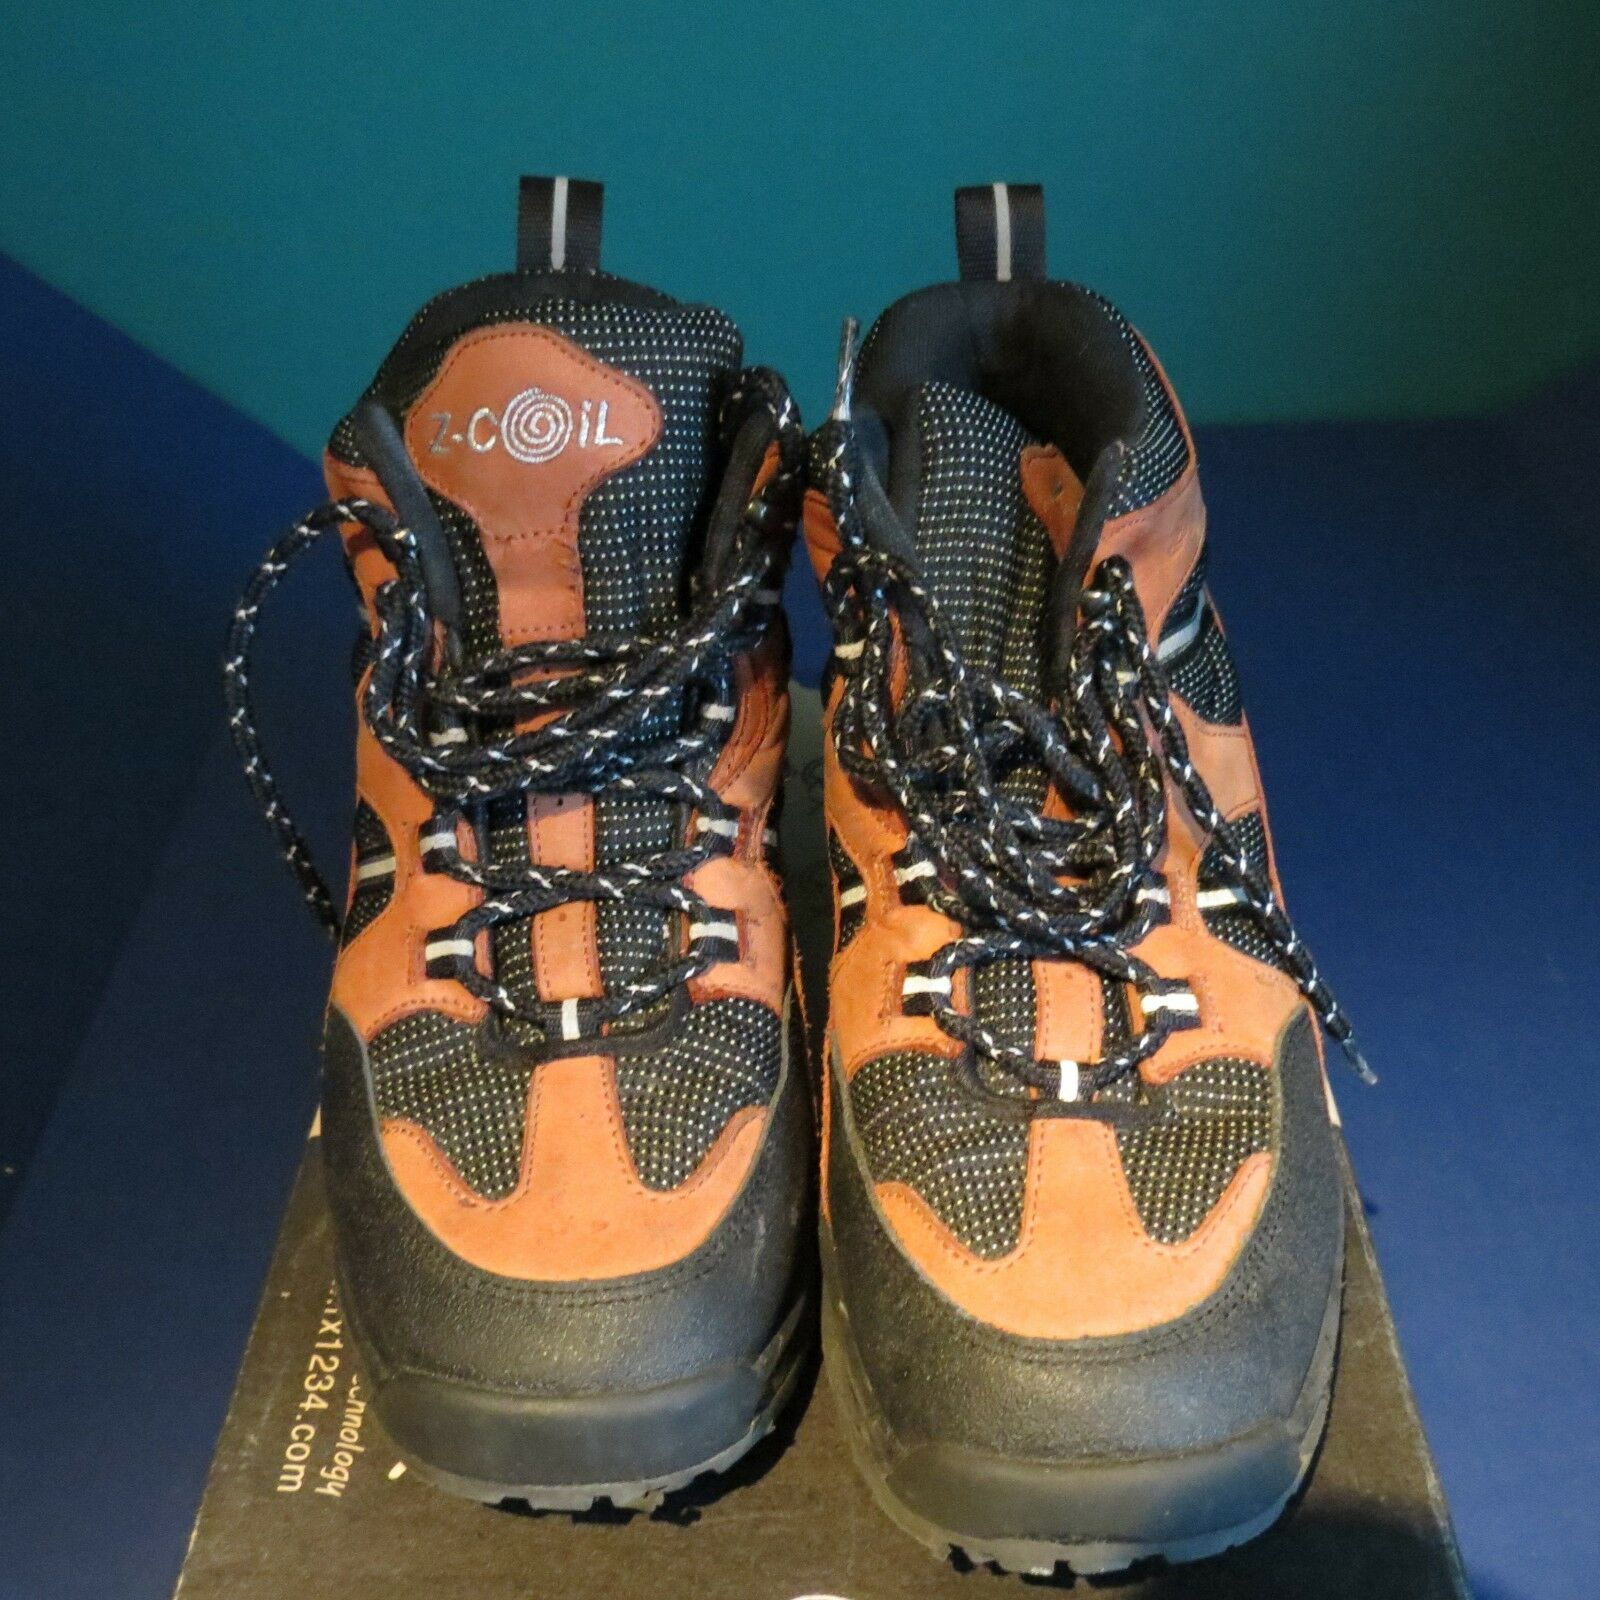 EUC Z-coil pain relief footwear damen 10 salmon salmon 10 Farbe hiker used 3 weeks 10207c